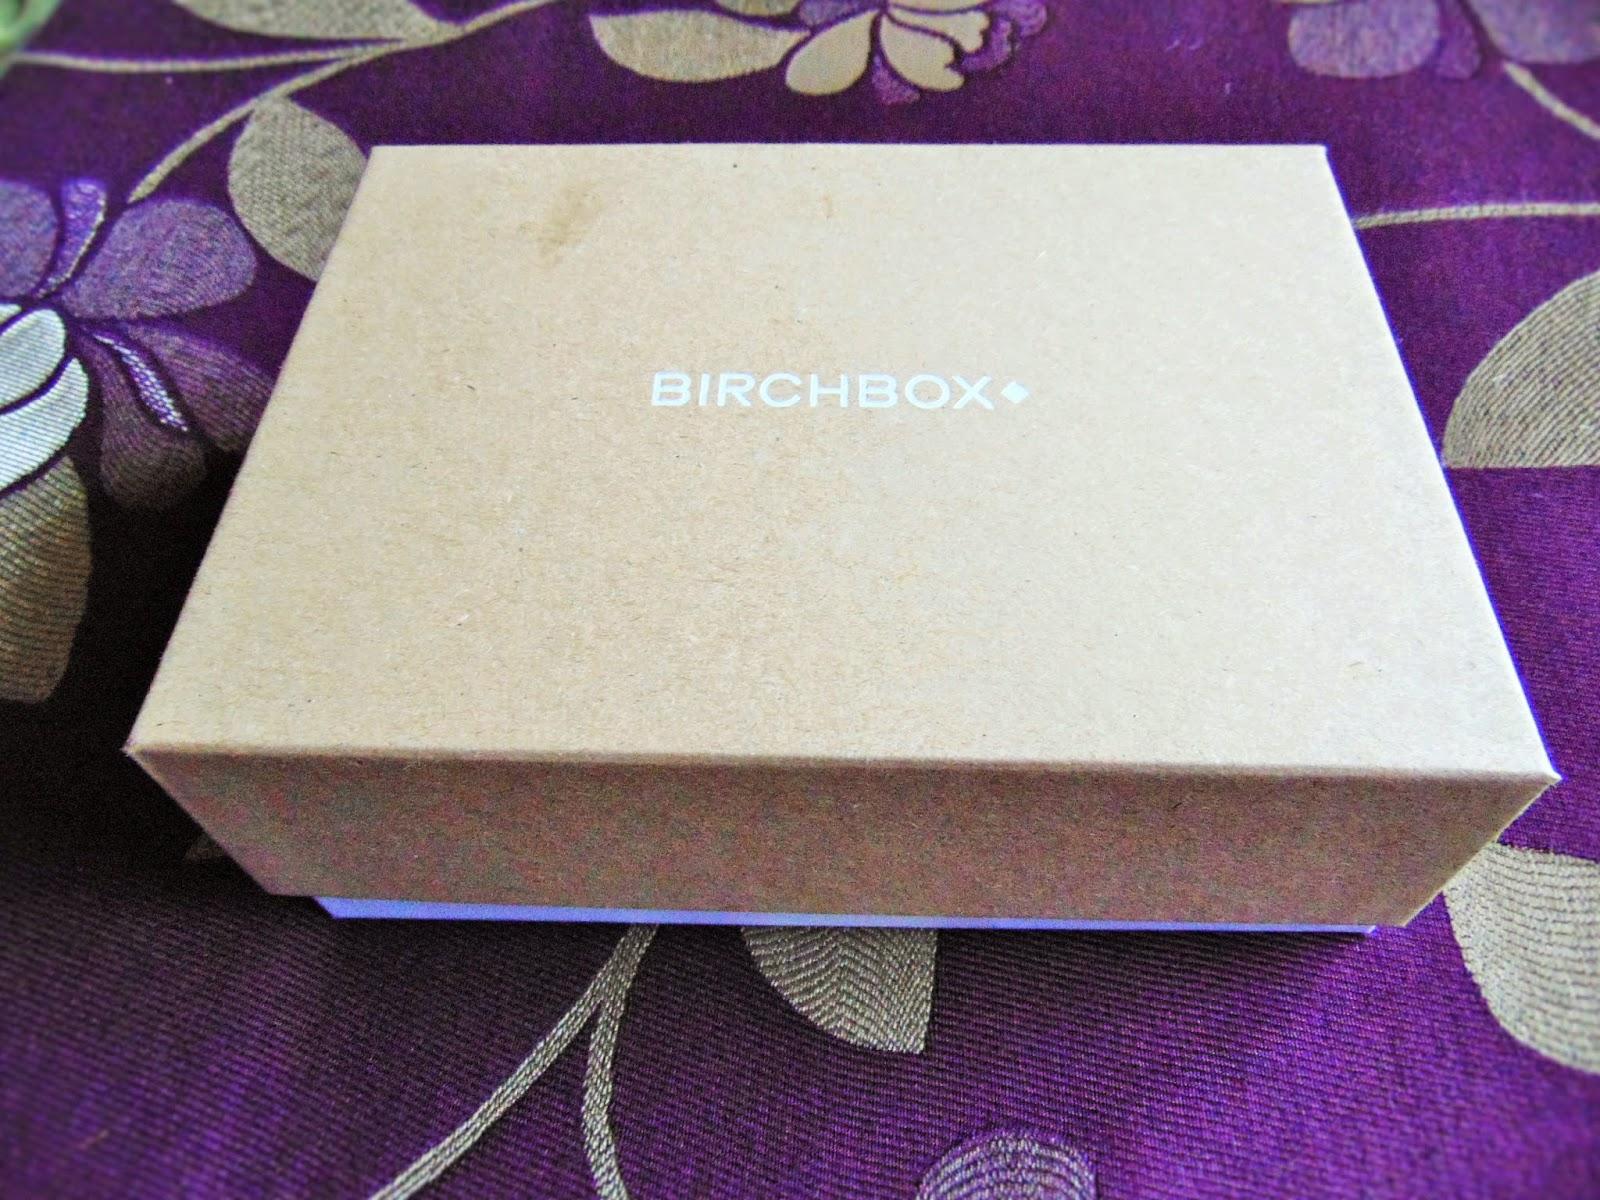 Birch Box February